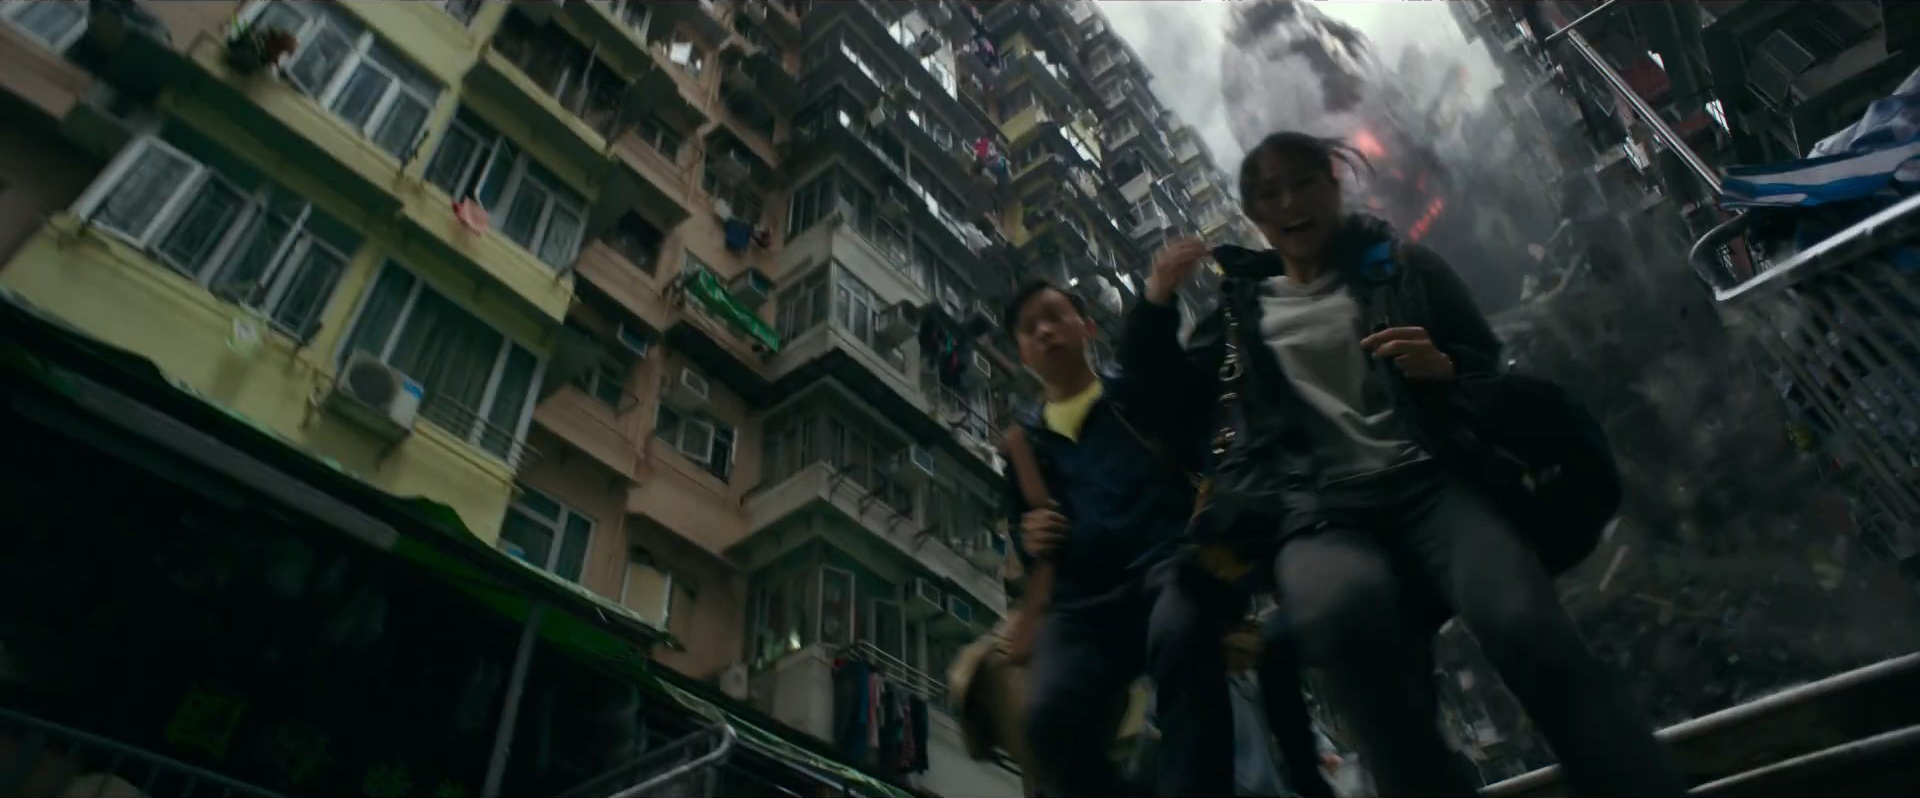 Godzilla vs Kong Trailer Still 02 - Mechagodzilla spotted?